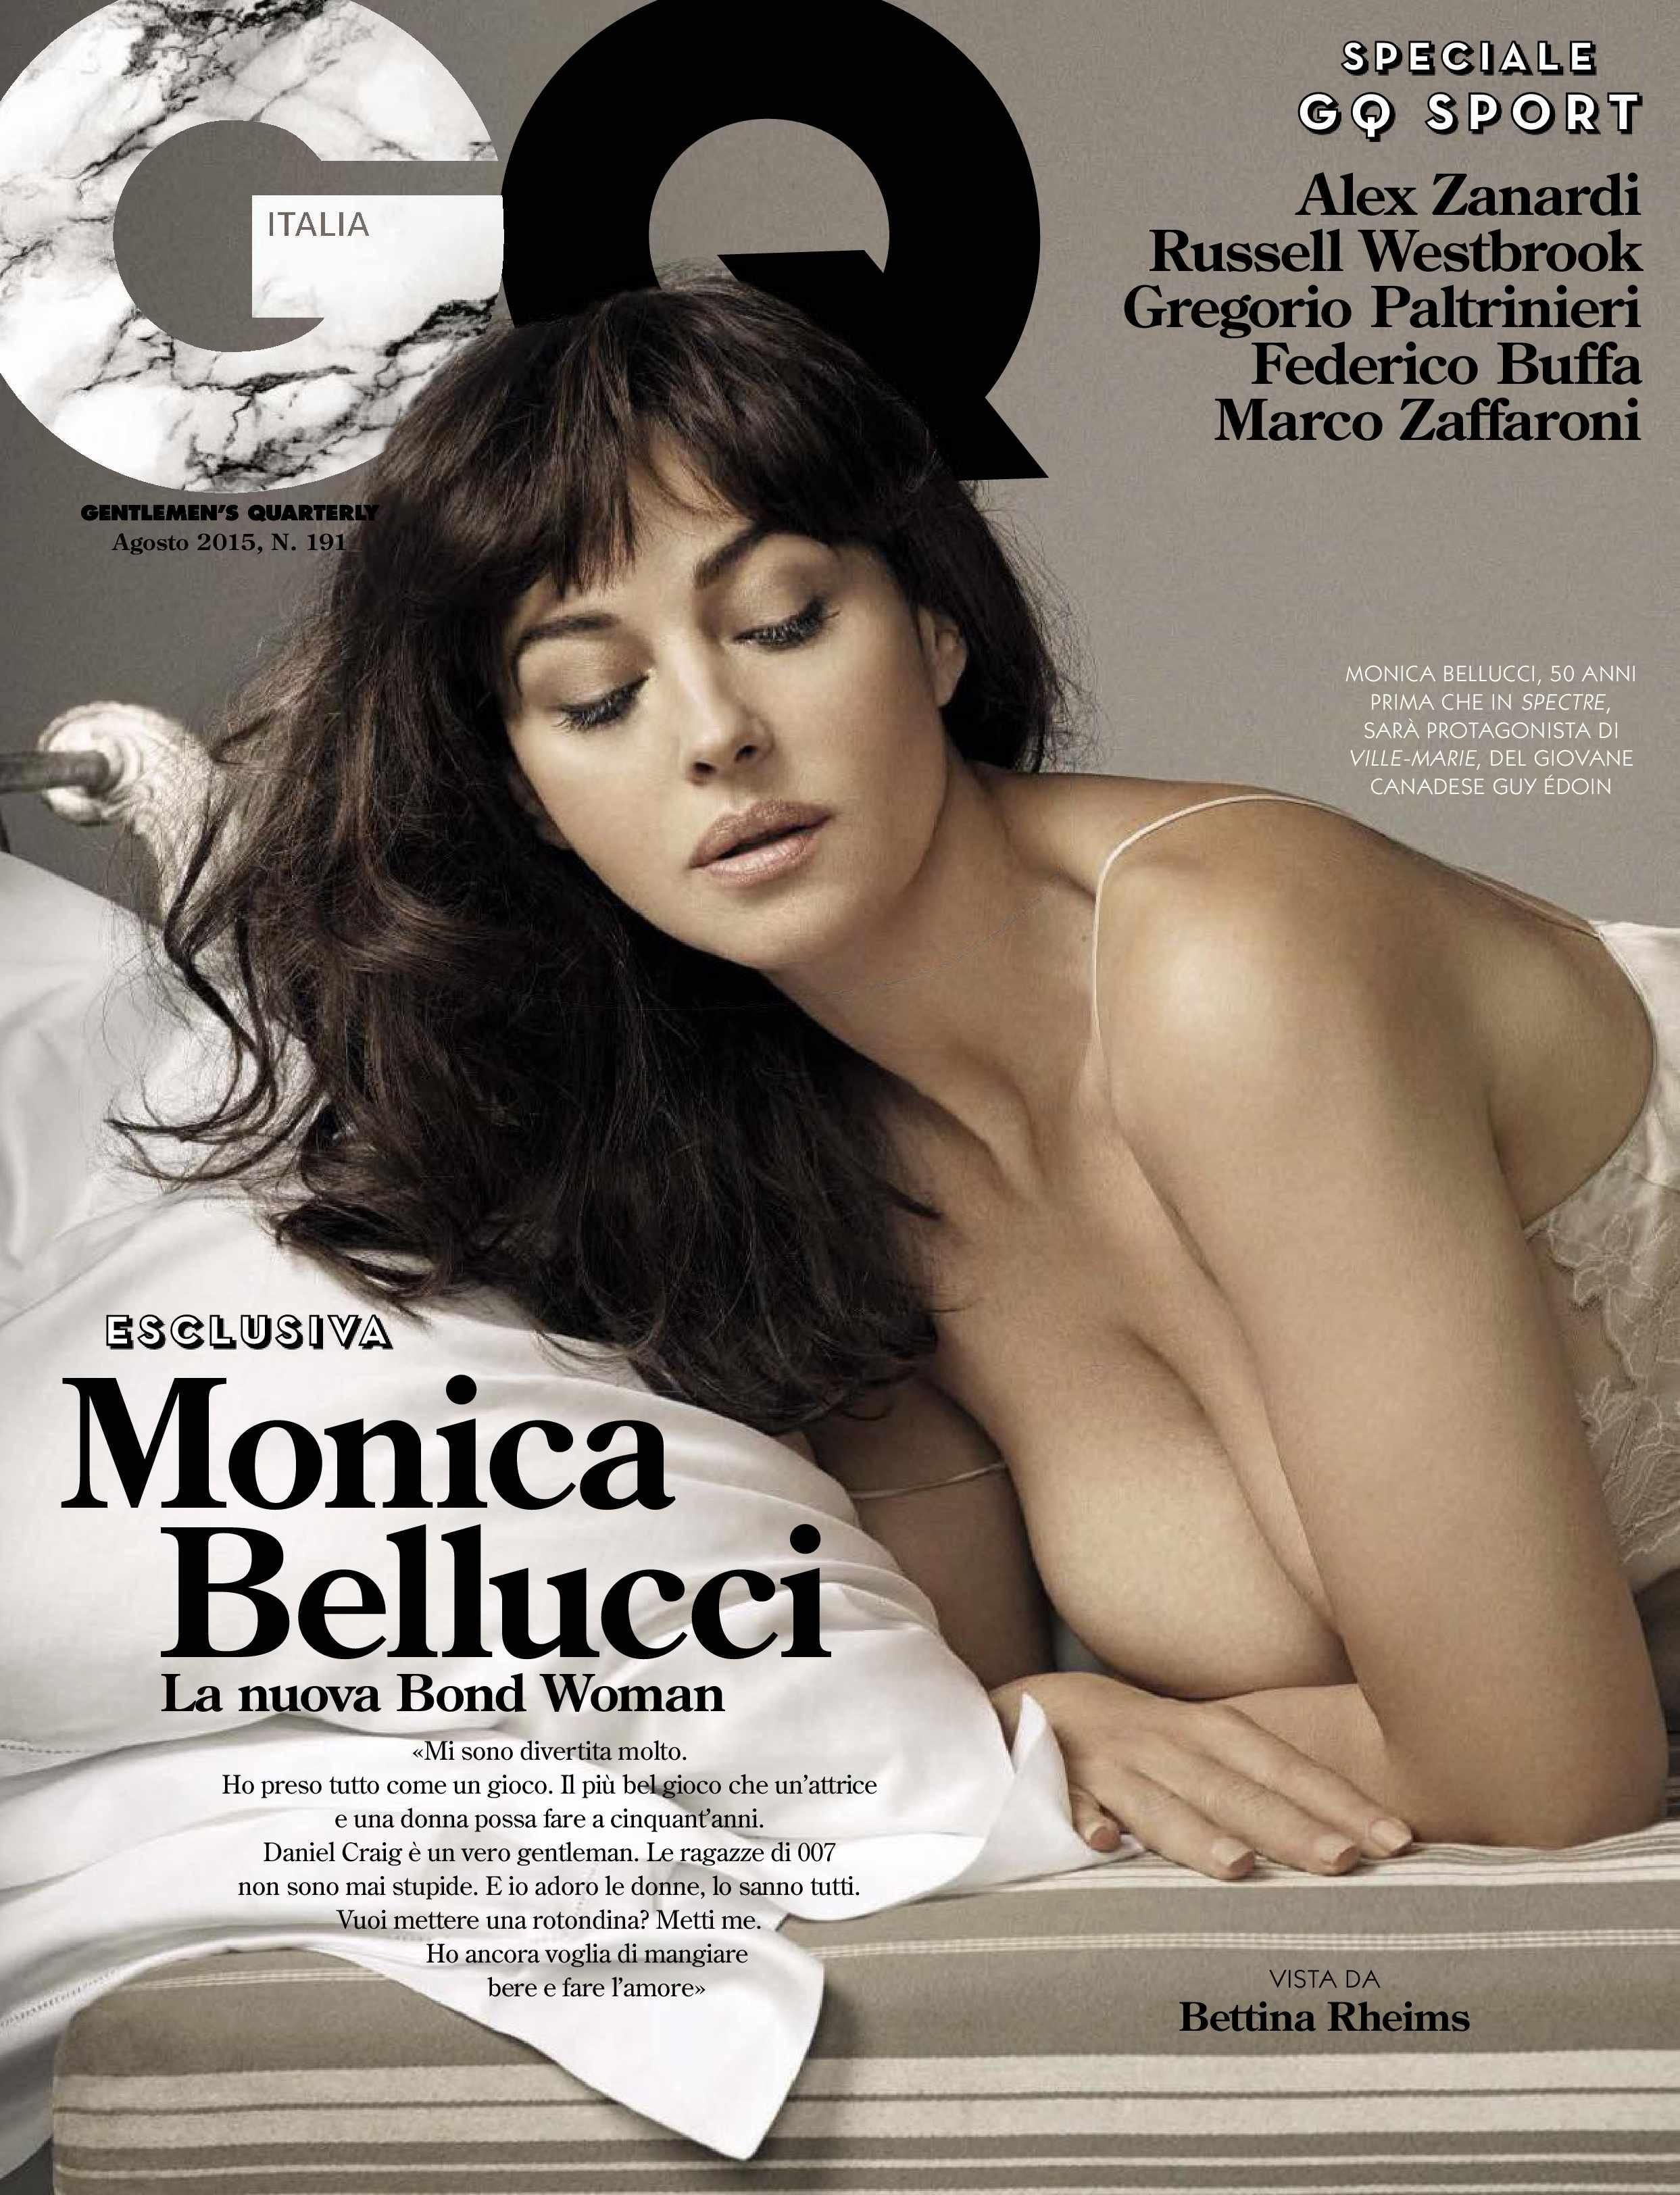 Monica Bellucci famosas modelos